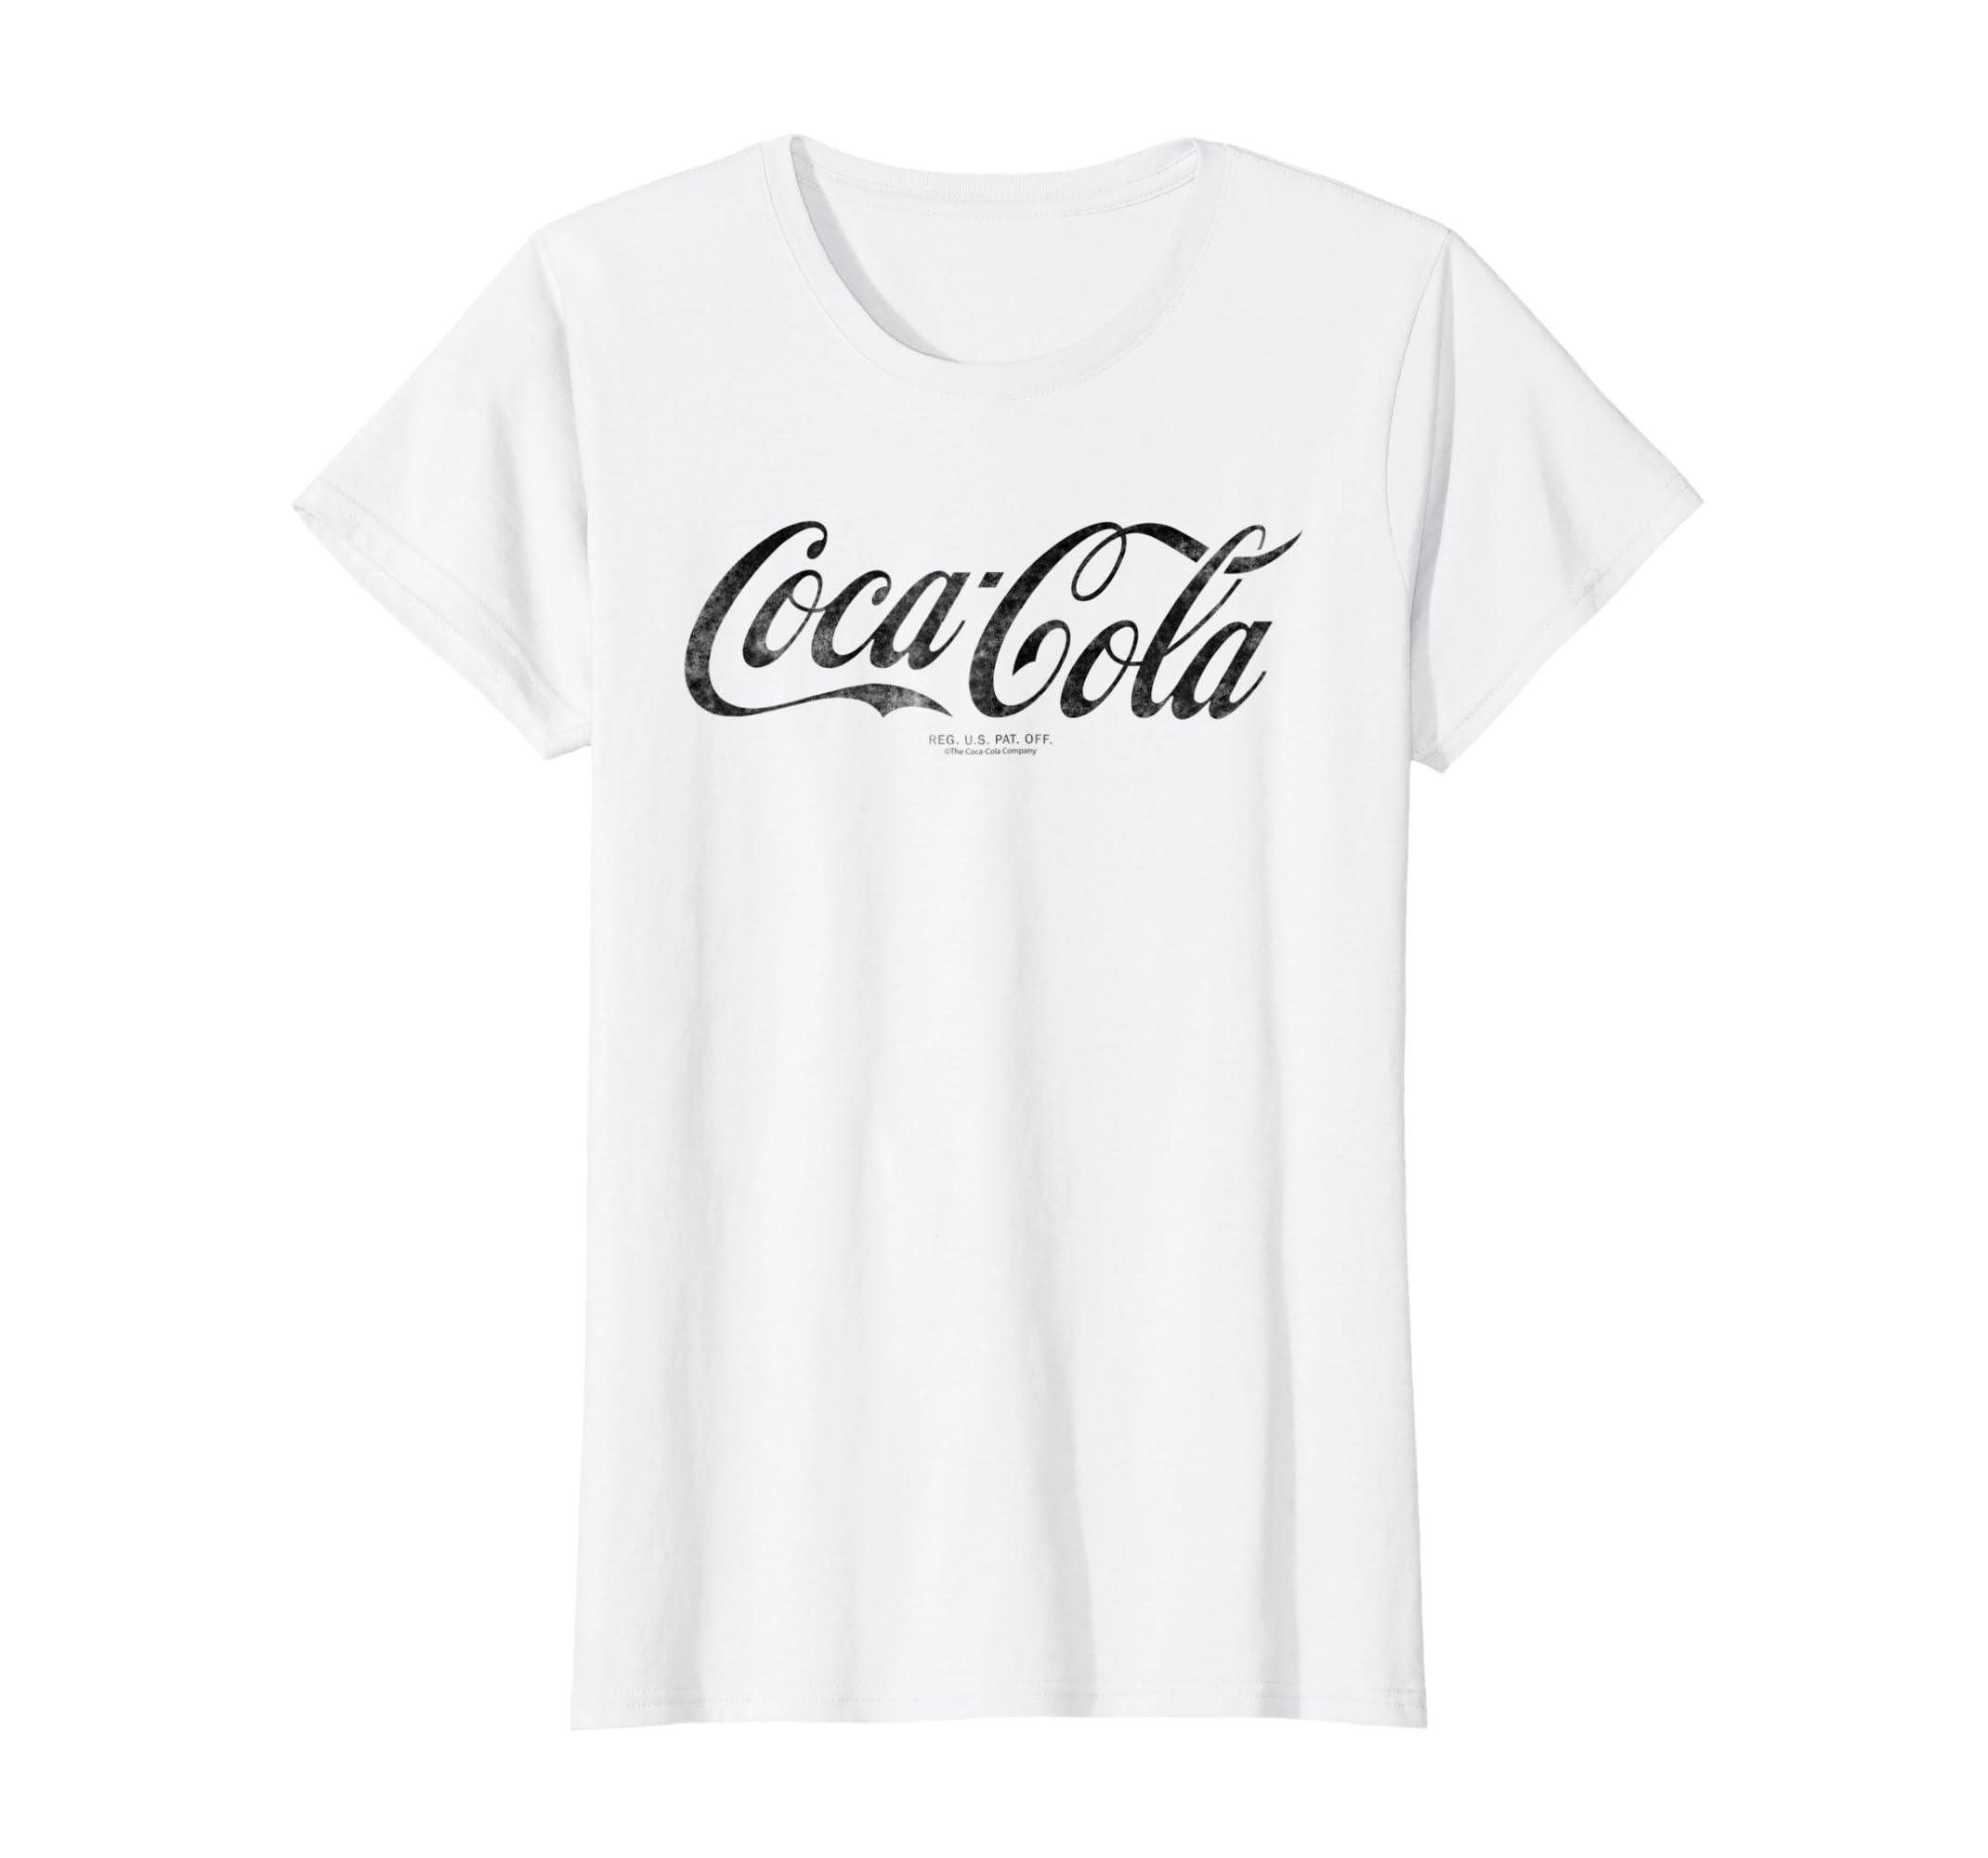 004ac544 Amazon.com: Coca-Cola Vintage Black Logo Graphic T-Shirt: Clothing